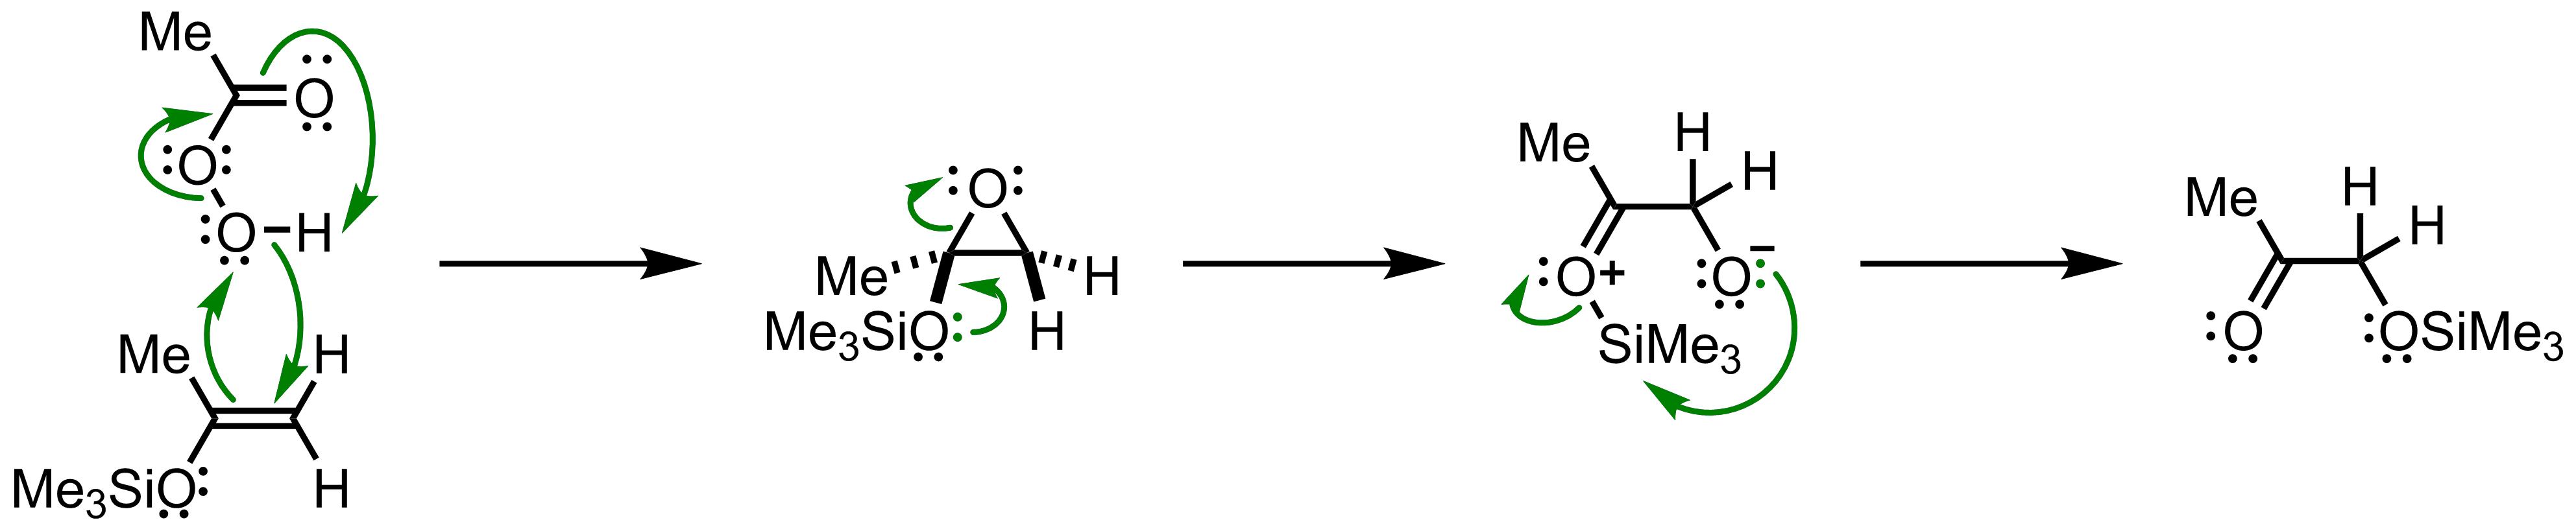 Mechanism of the Rubottom Oxidation